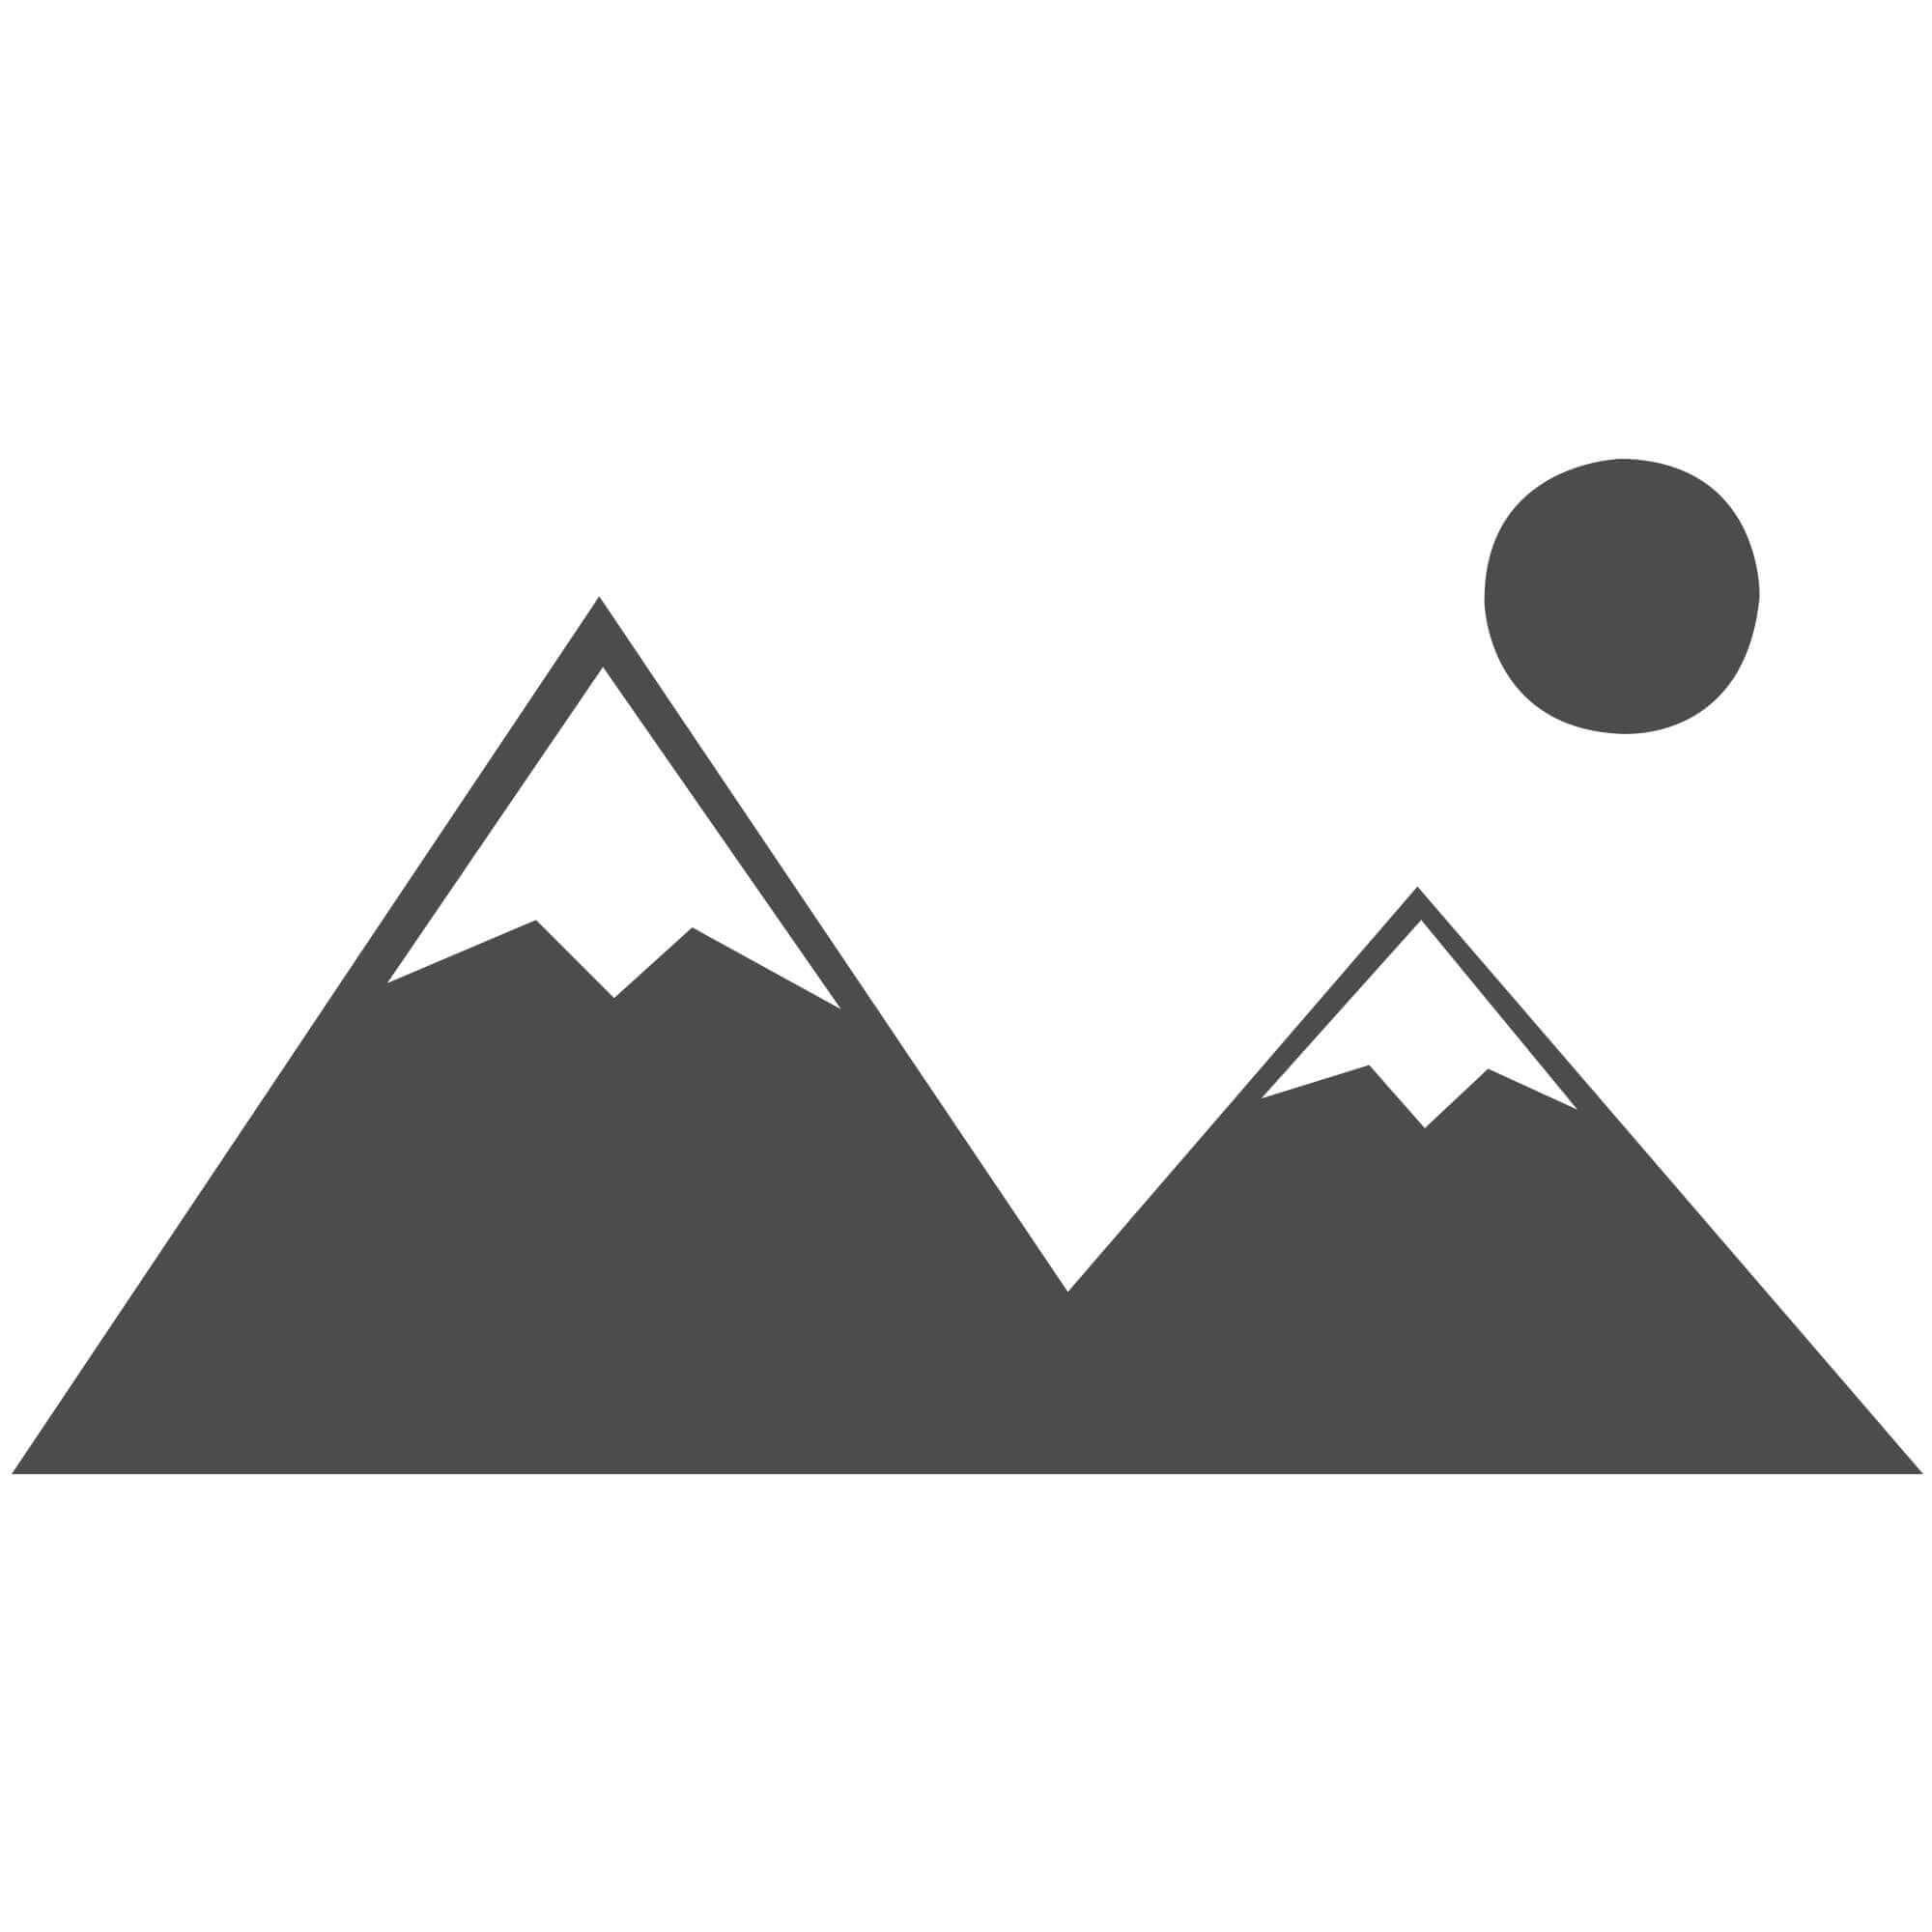 "Verge Ridge Terracotta  Rug - Size 120 x 170 cm (4' x 5'7"")"